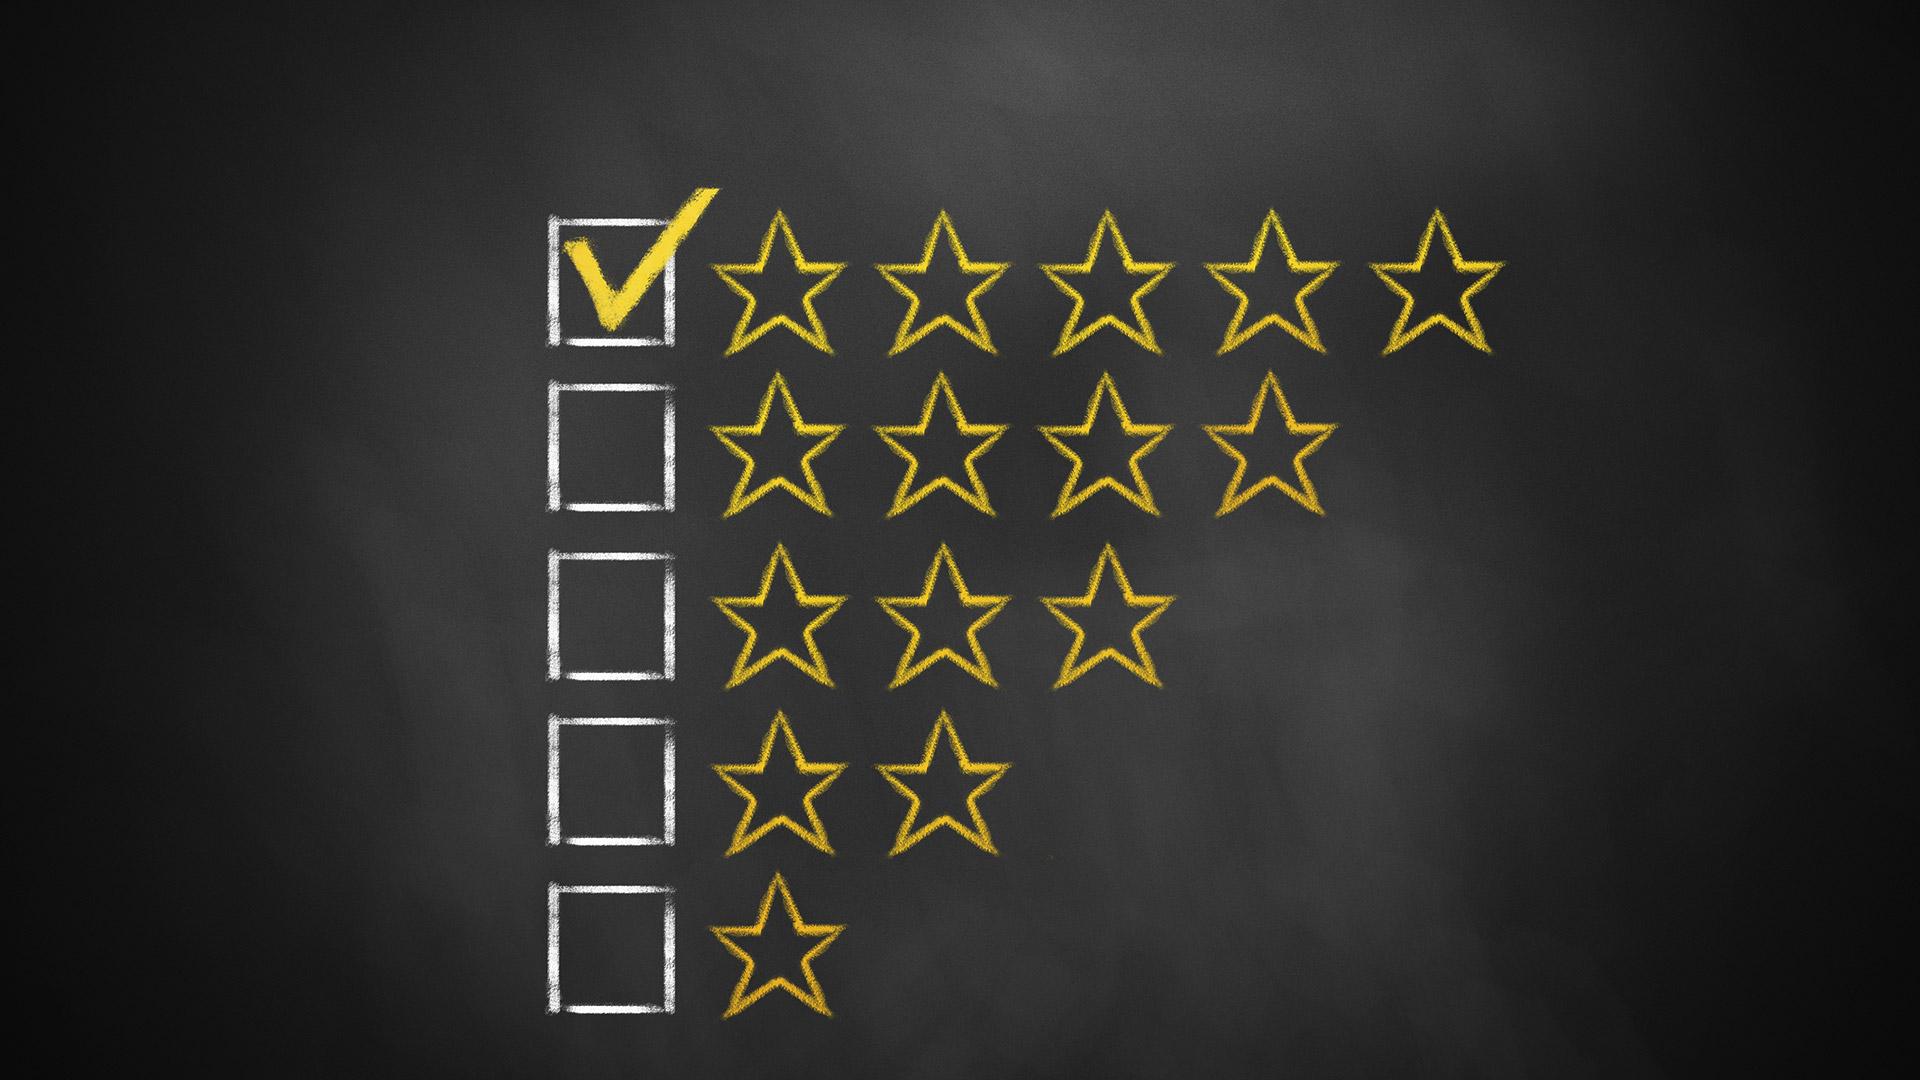 reviews-ratings-stars-ss-1920